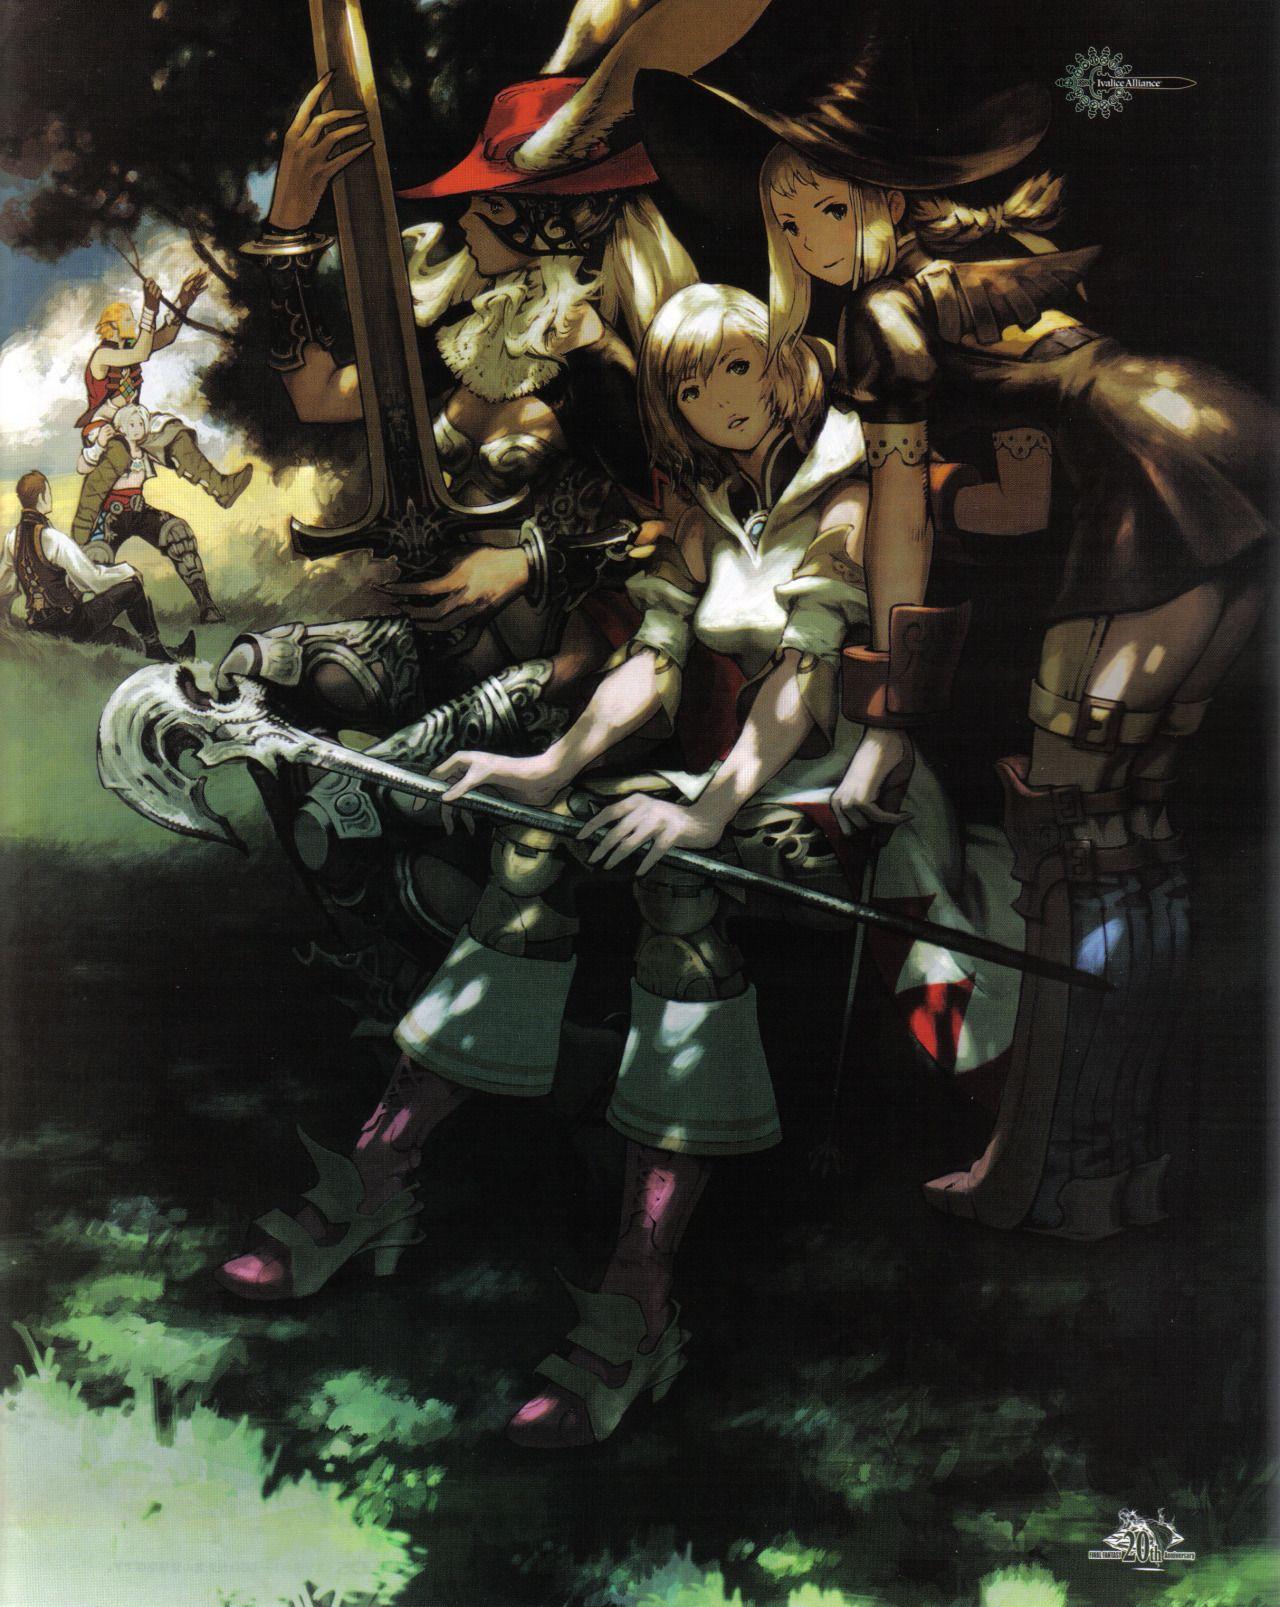 Final Fantasy 12 Hentai videogame art saturdays - final fantasy xii international